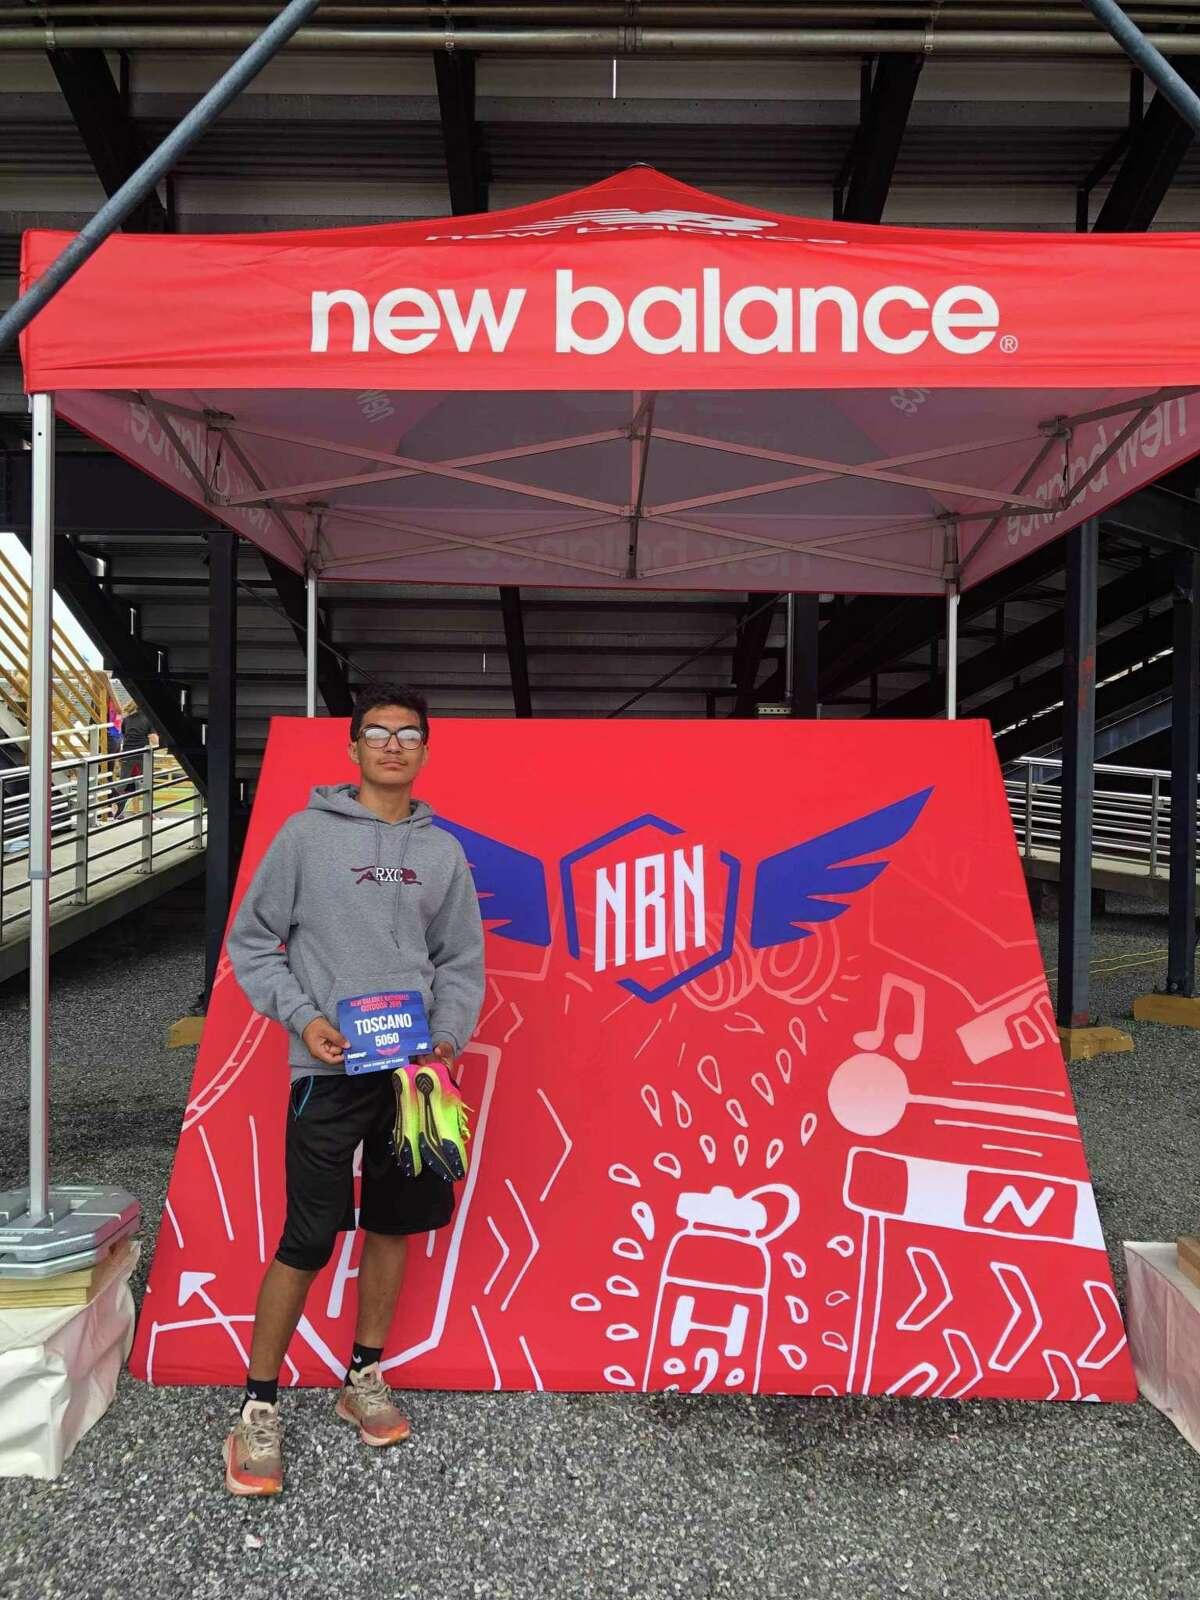 Laredoan Carlos Toscano earned an invitation to theNew Balance Outdoor Nationals meet and will run Thursday at North Carolina AT& University in Greensboro, North Carolina.